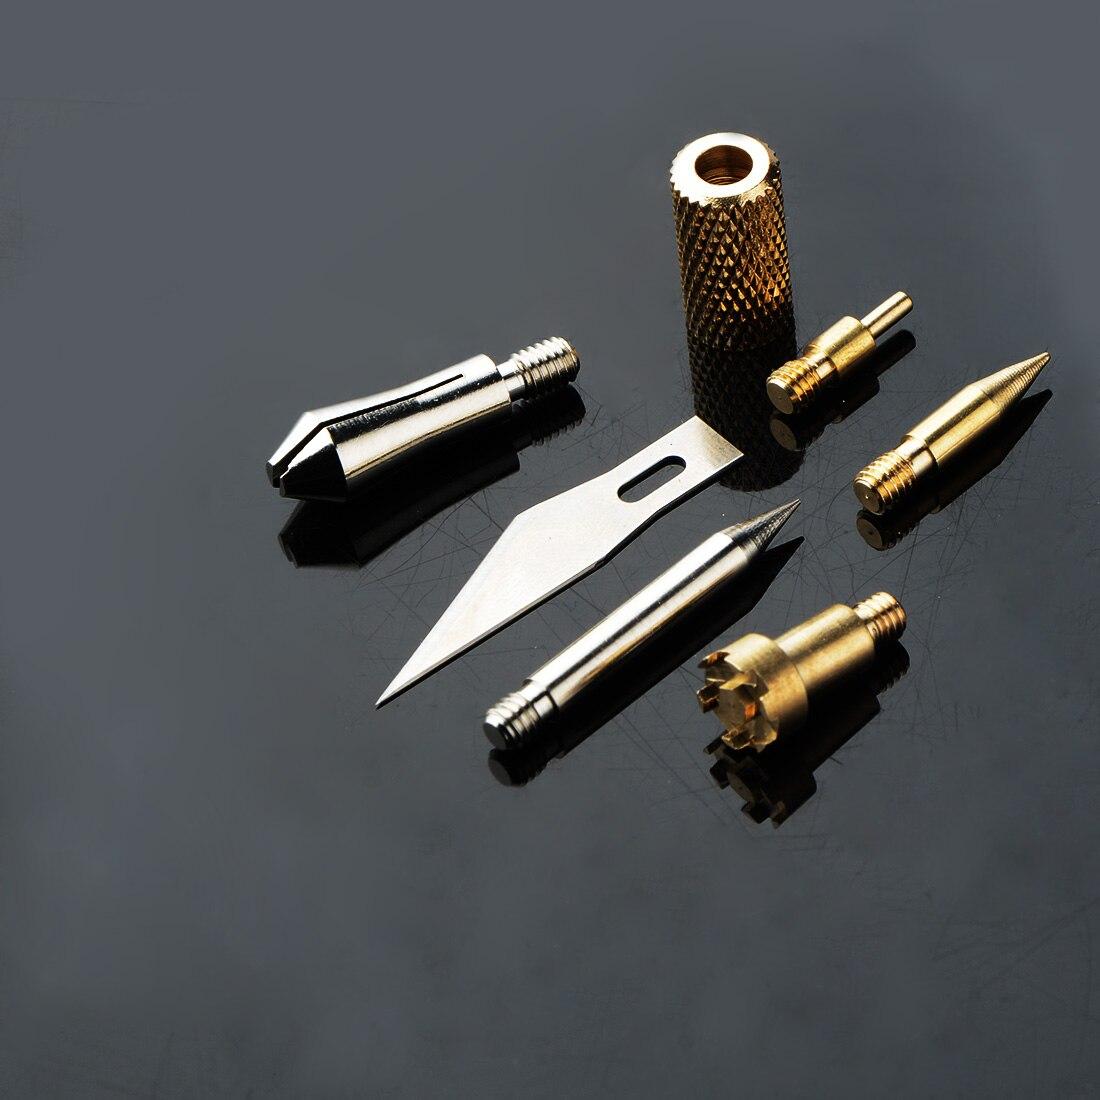 7pcs Wood Burning Pen Set Welding Tips & Stencil Set Soldering Iron Carving Tools For DIY Craft